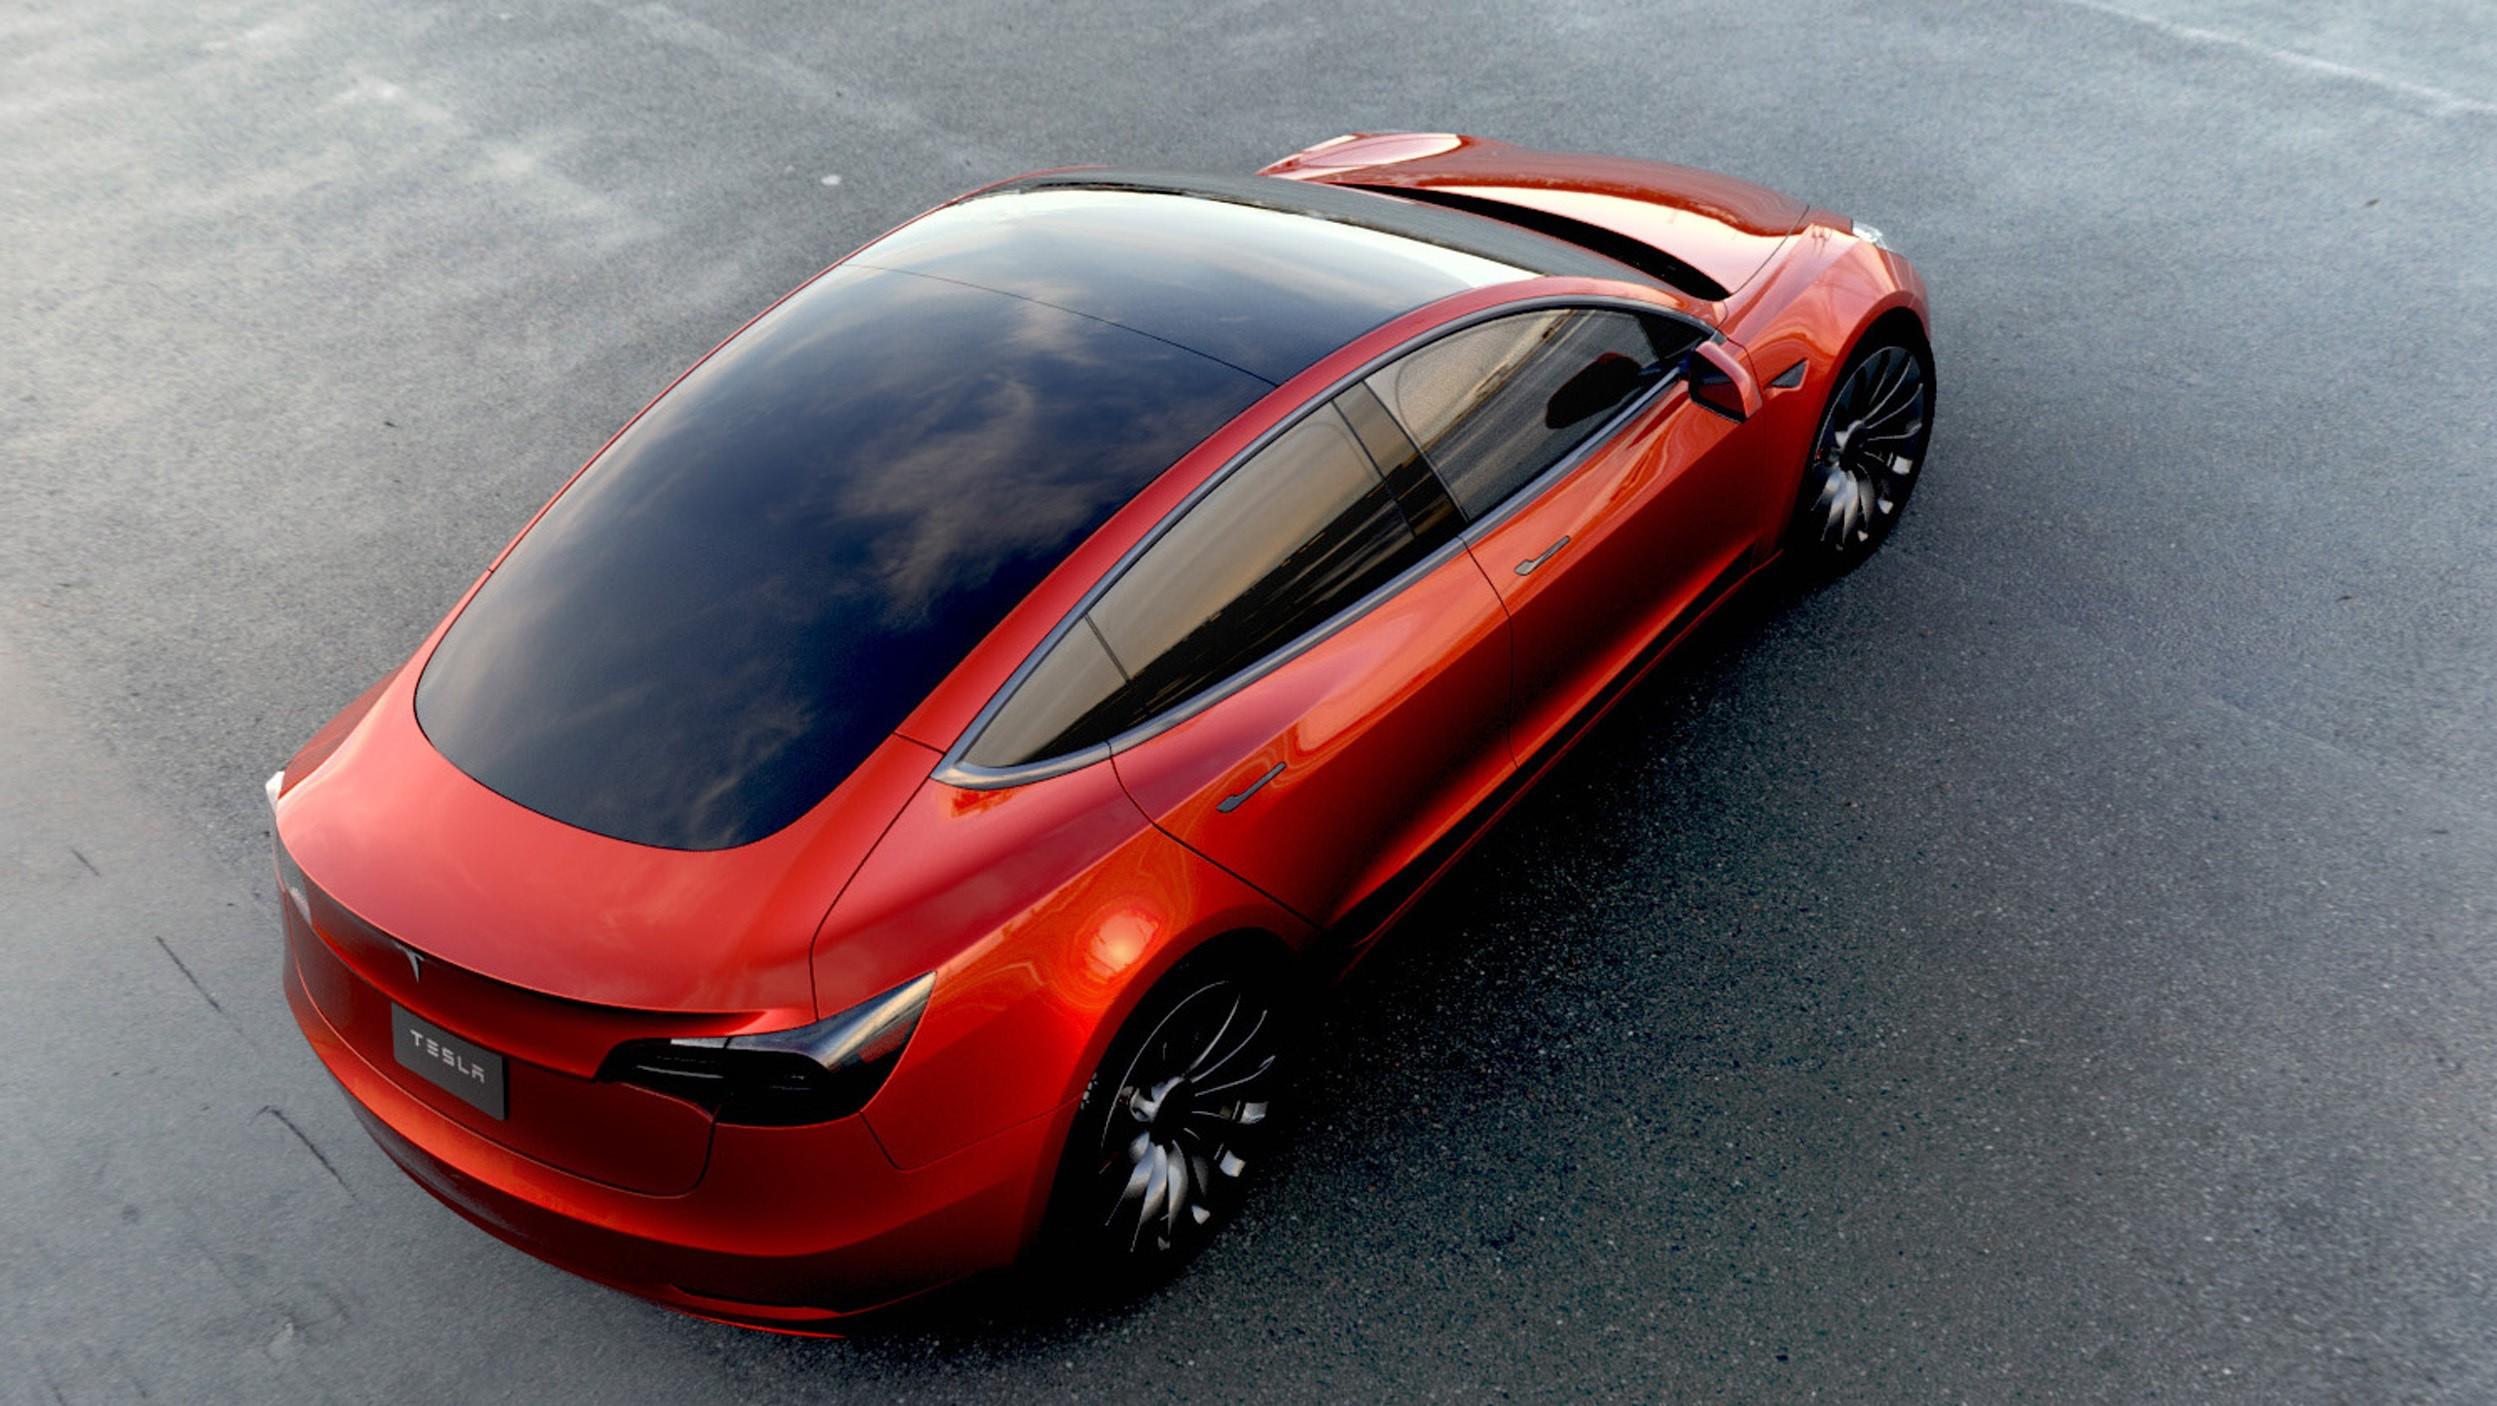 Best Way To Clean Car Seats >> Tesla Model 3 Interior in Broad Daylight Looks like ...